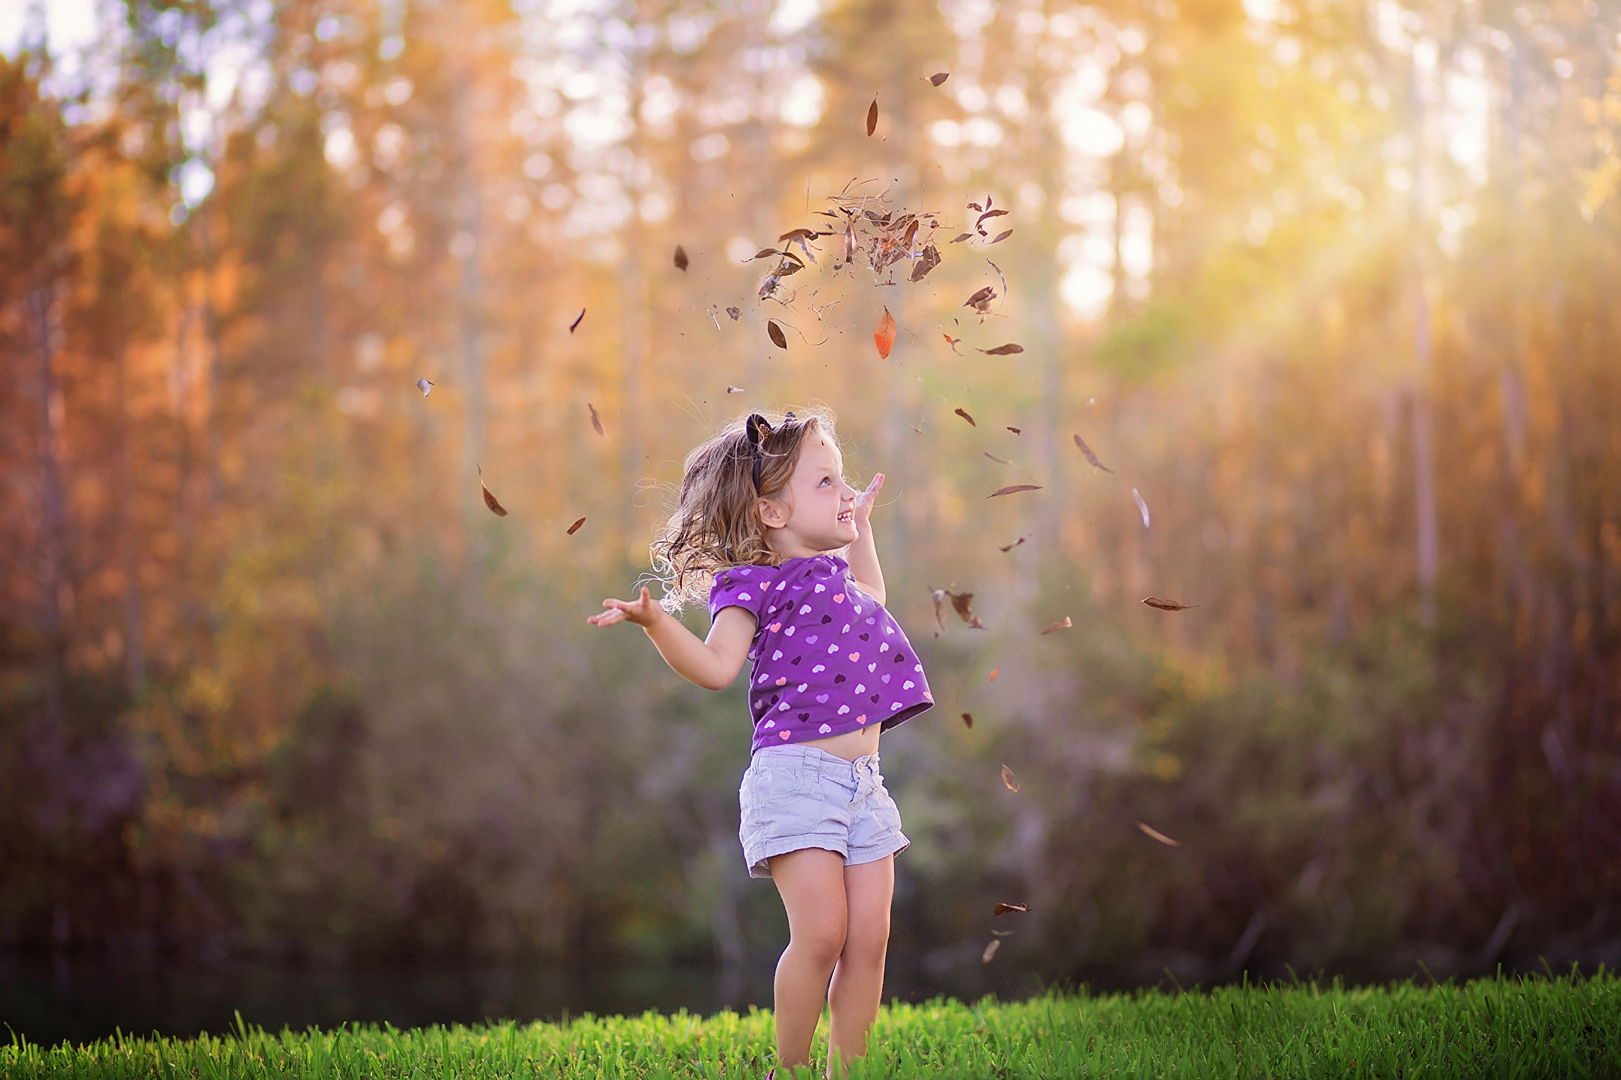 Demo foto eMotion: nena hojas (antes)